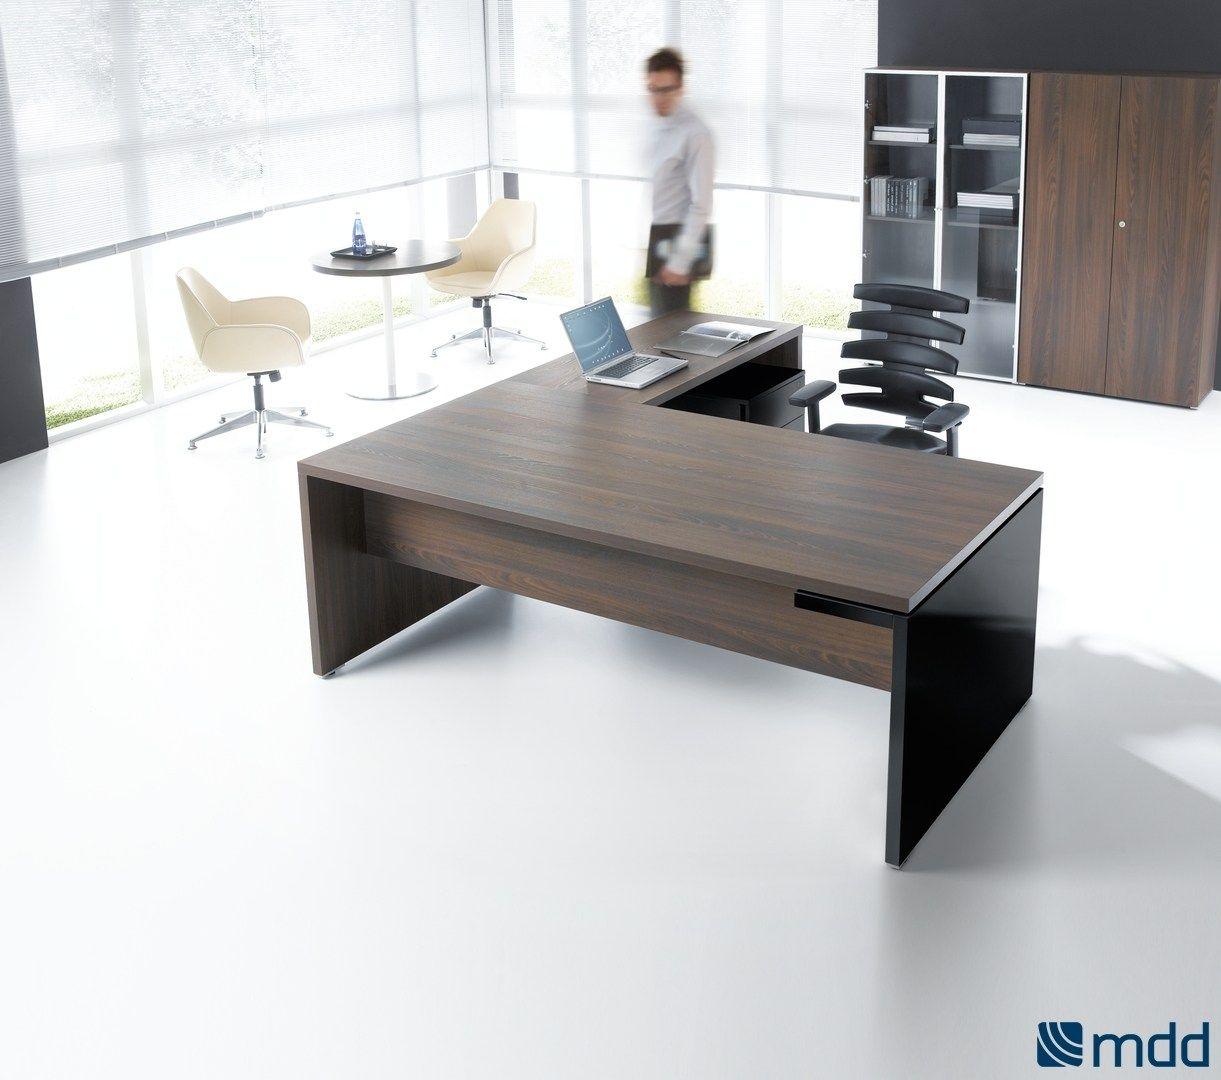 Mito escritorio de oficina ejecutivo by mdd dise o simone for Diseno de escritorios de oficina